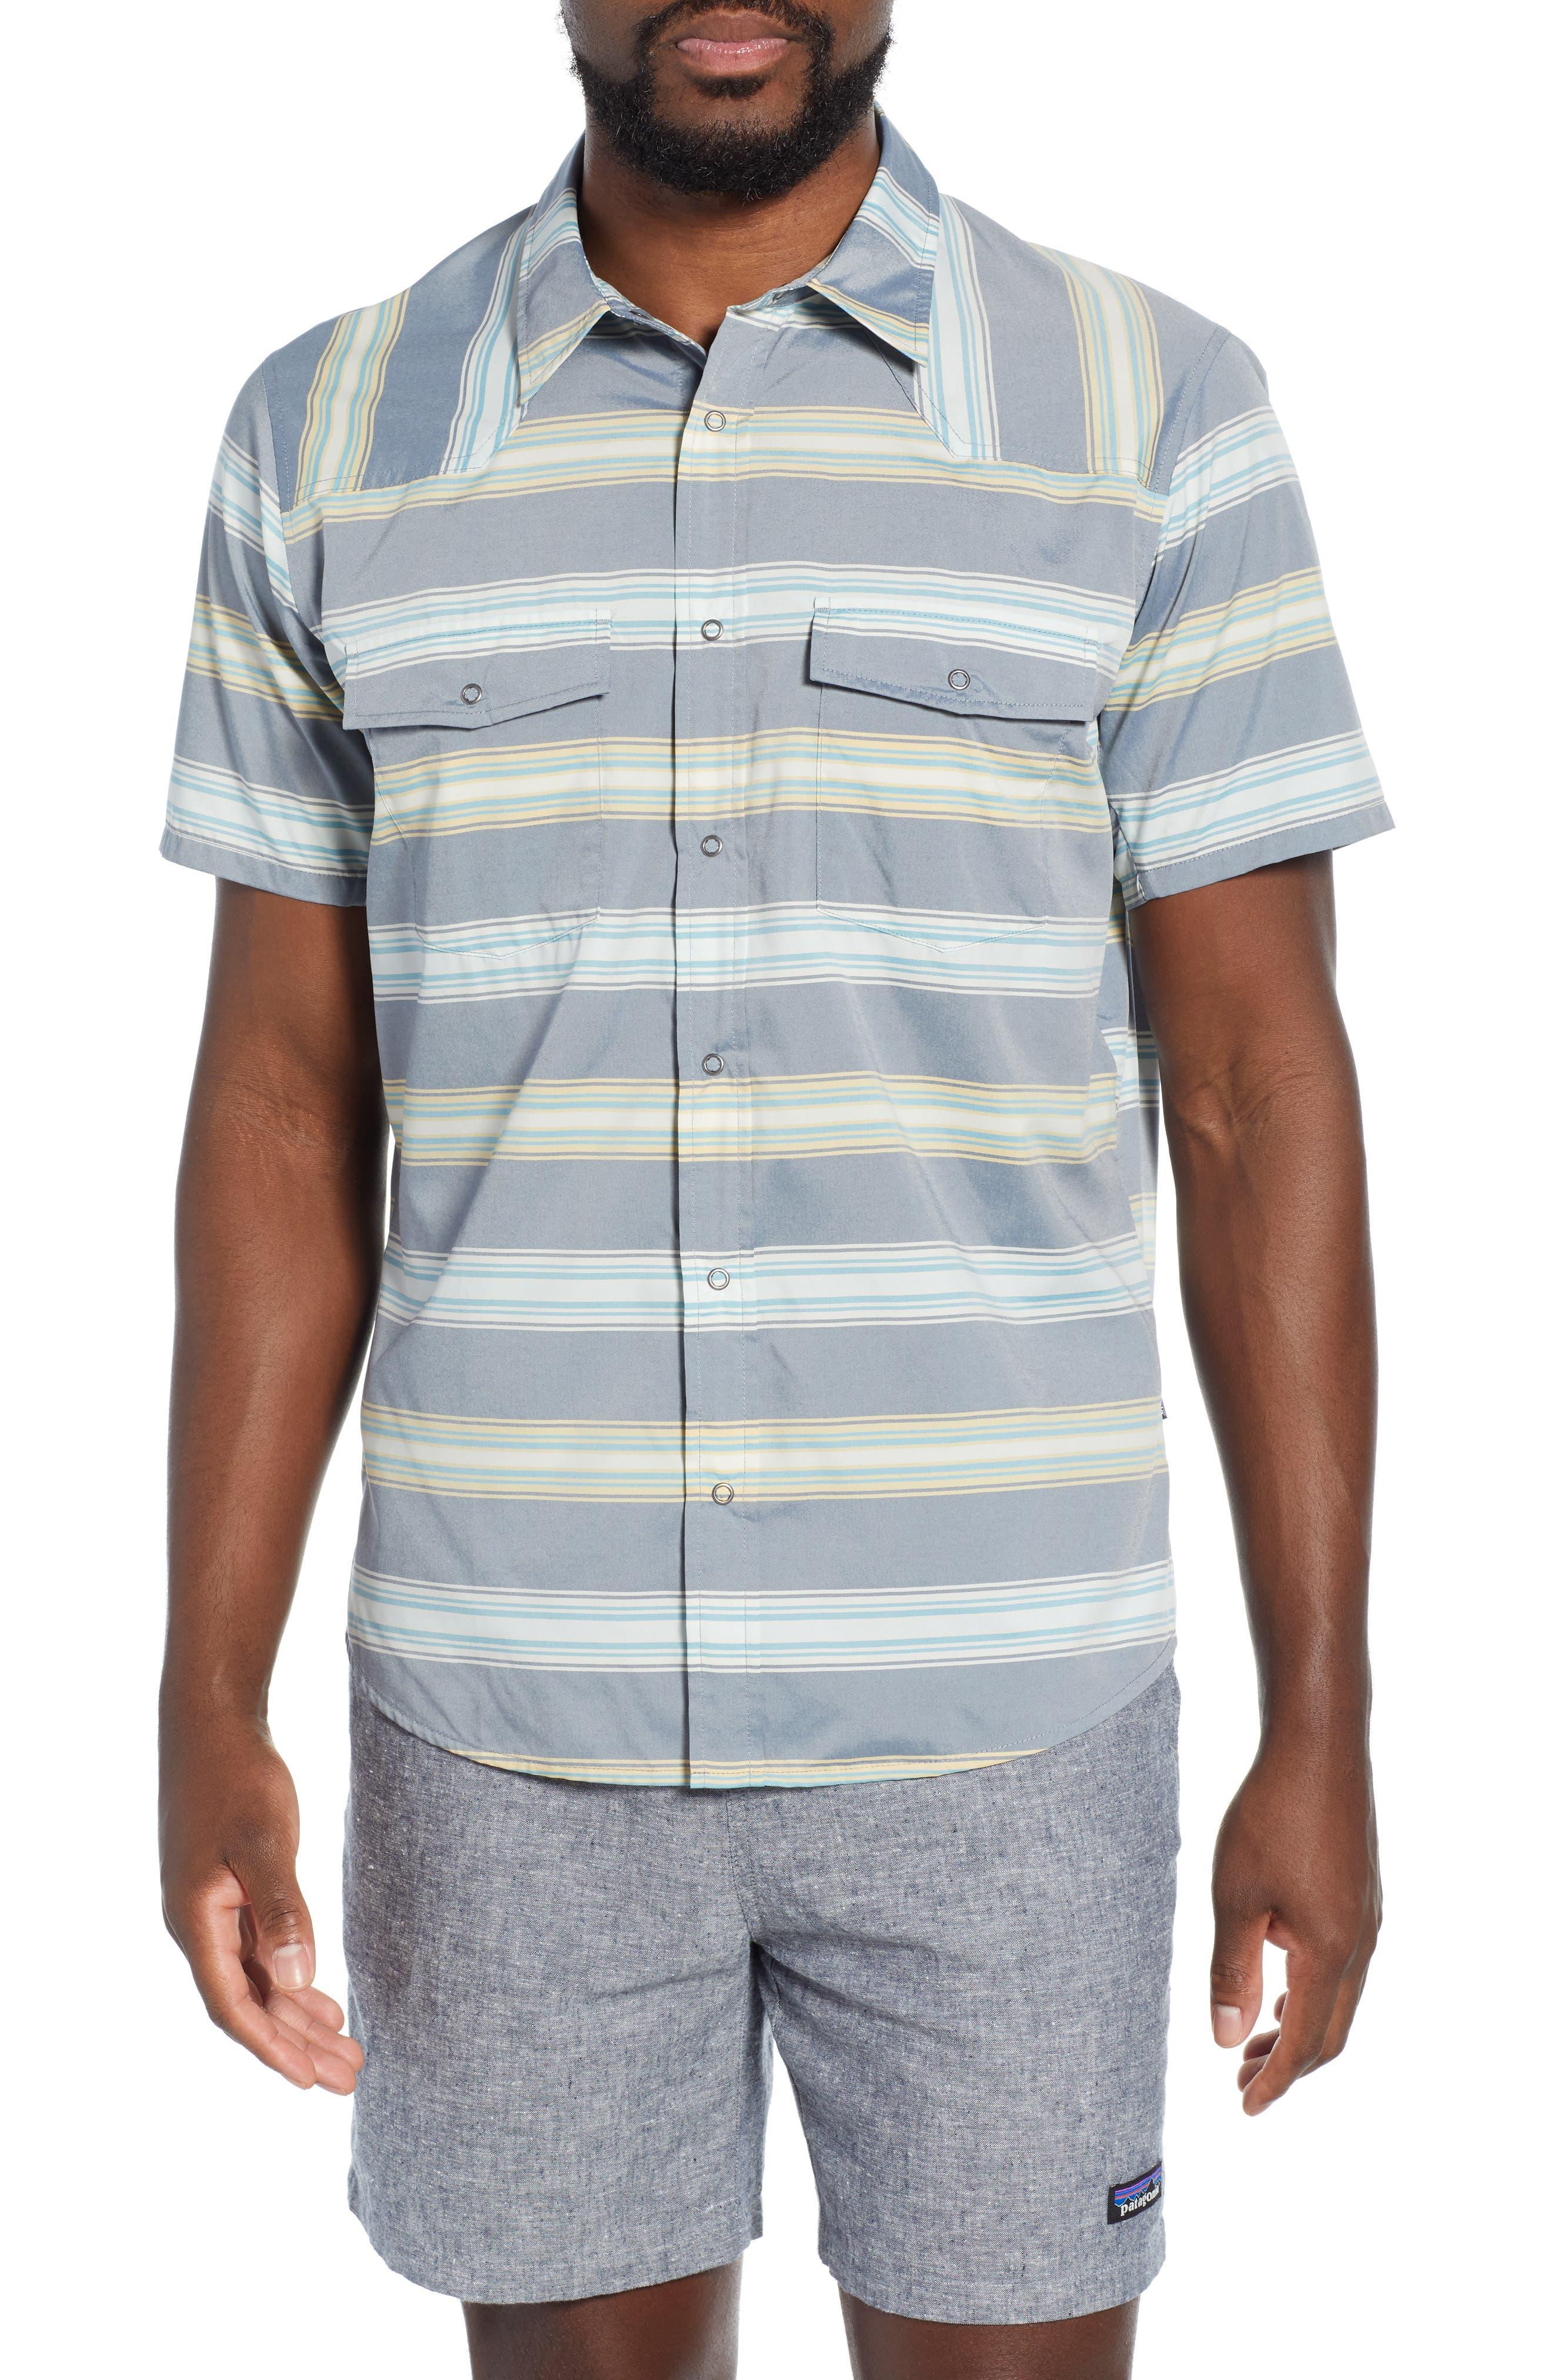 Patagonia Bandito Regular Fit Short Sleeve Sport Shirt, Blue